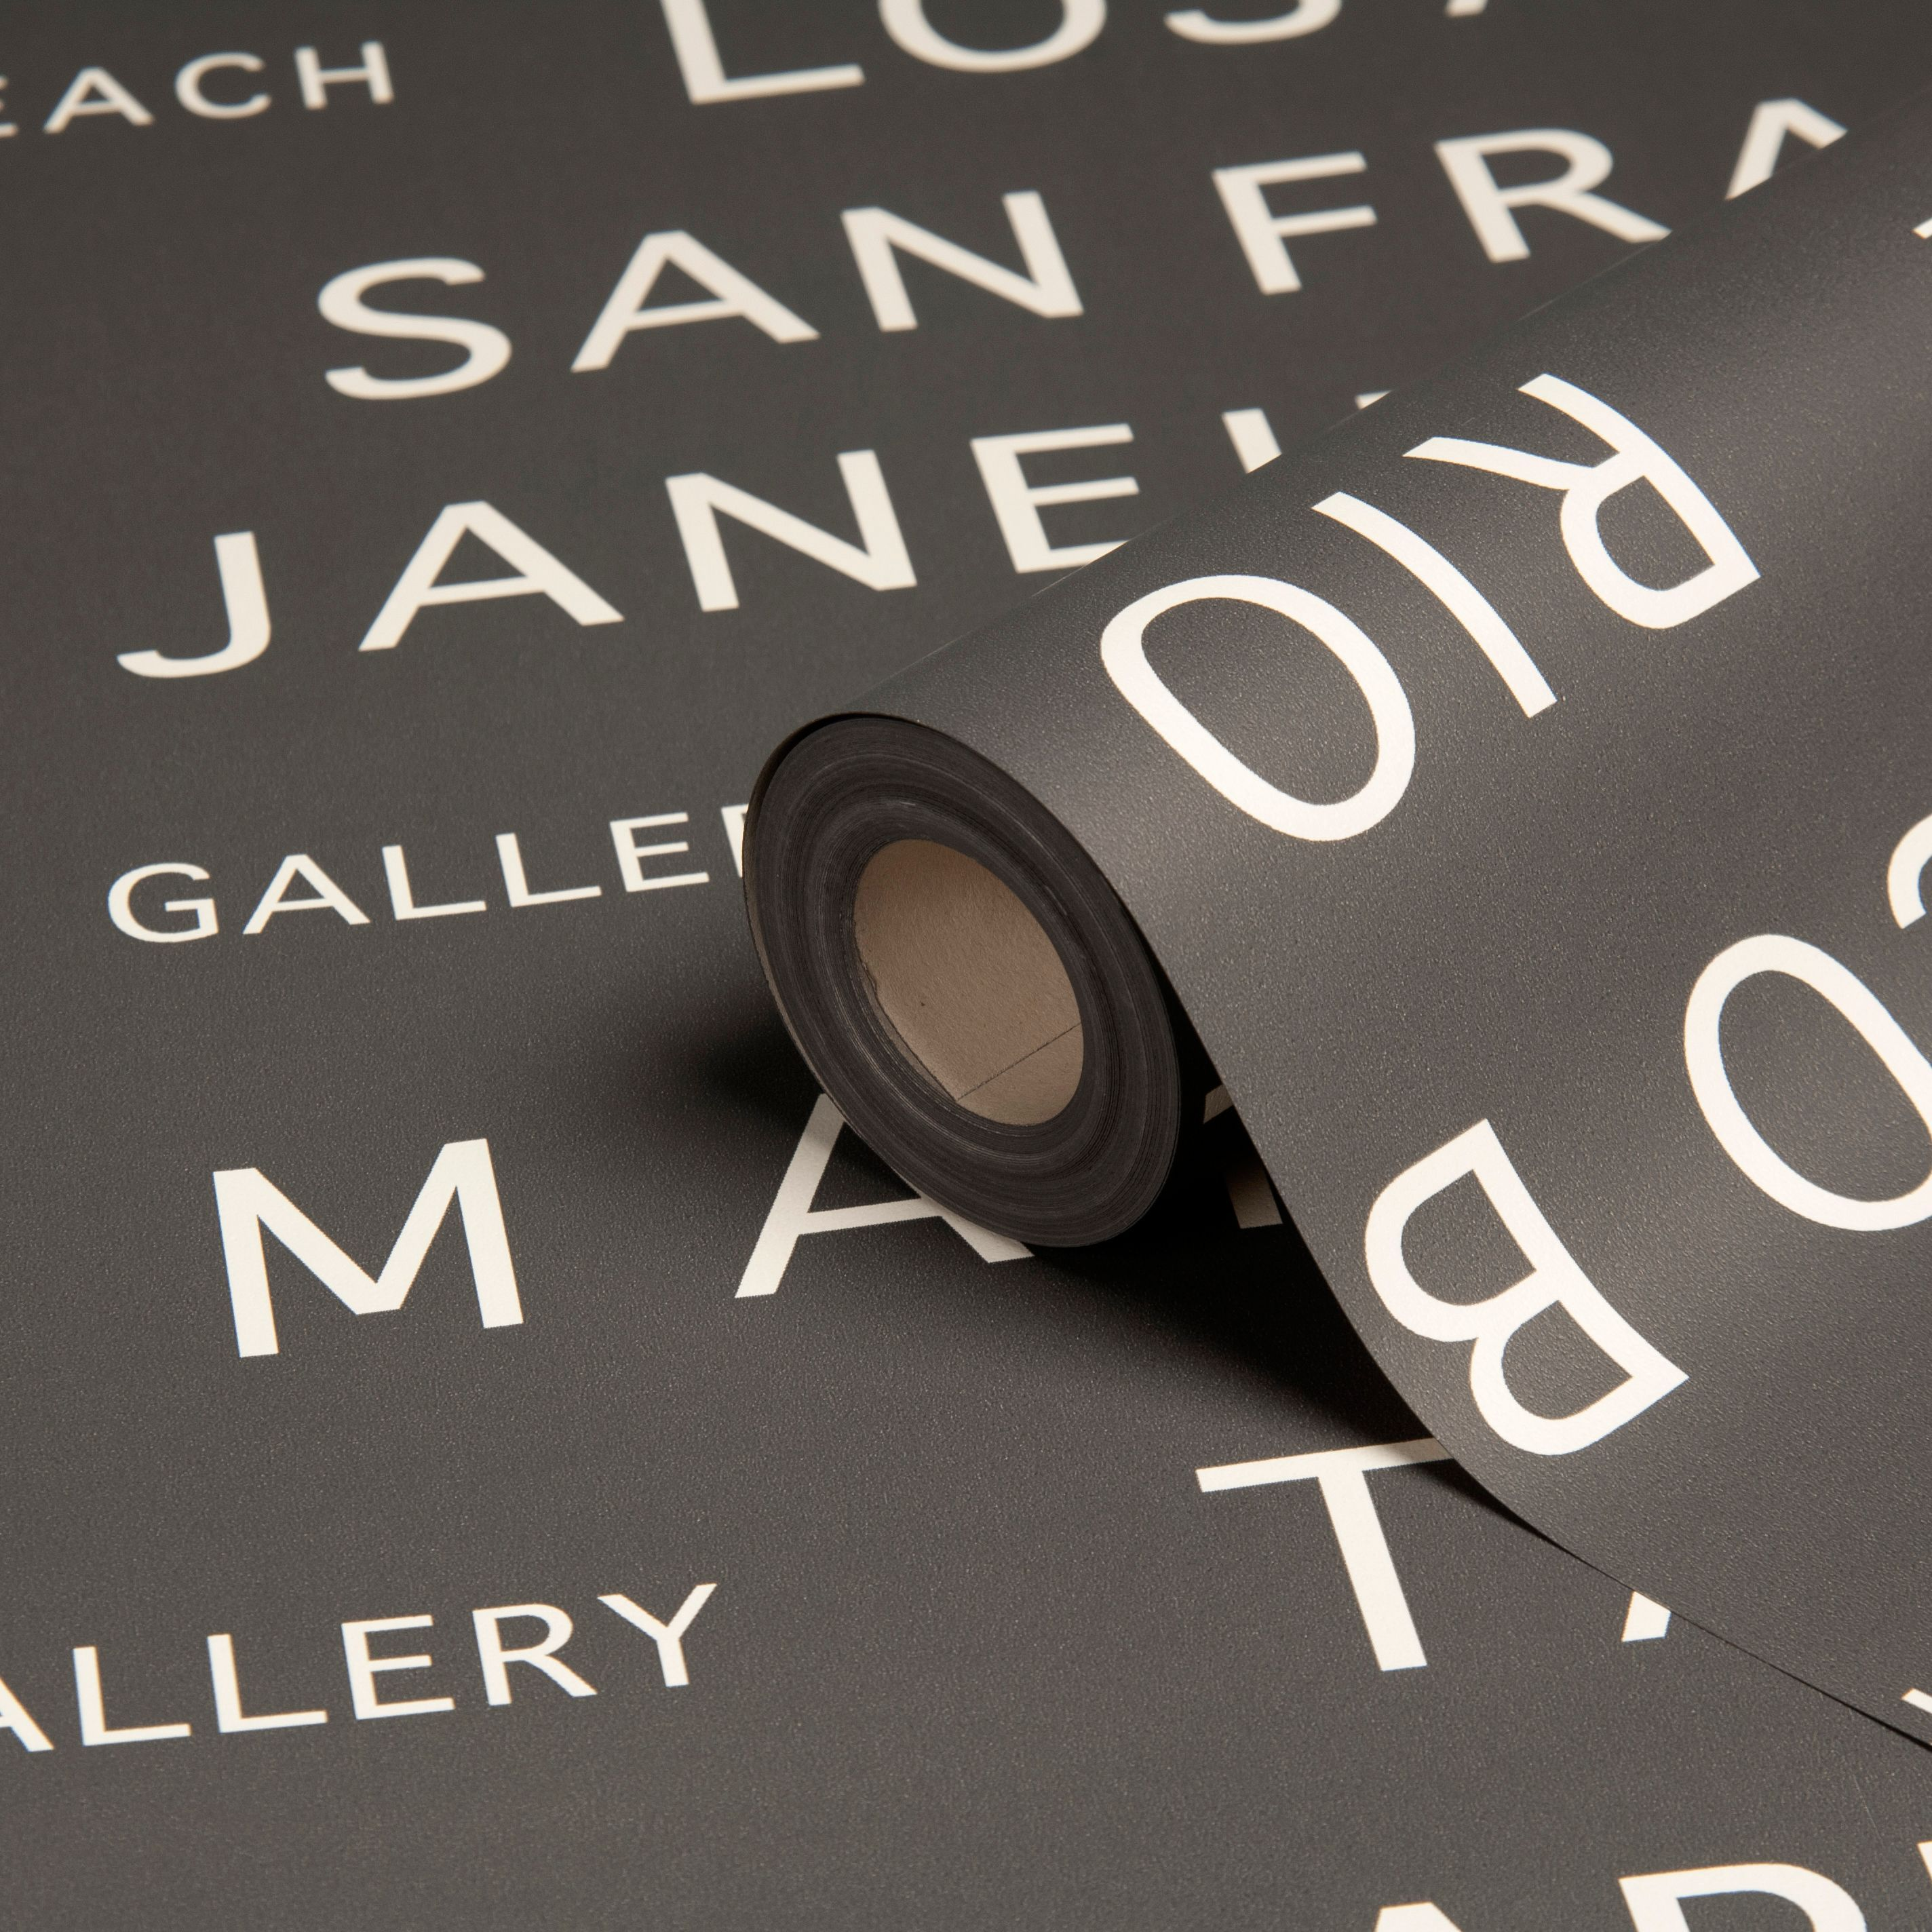 Bus Tour Typography Grey Metallic Effect Wallpaper Getting This